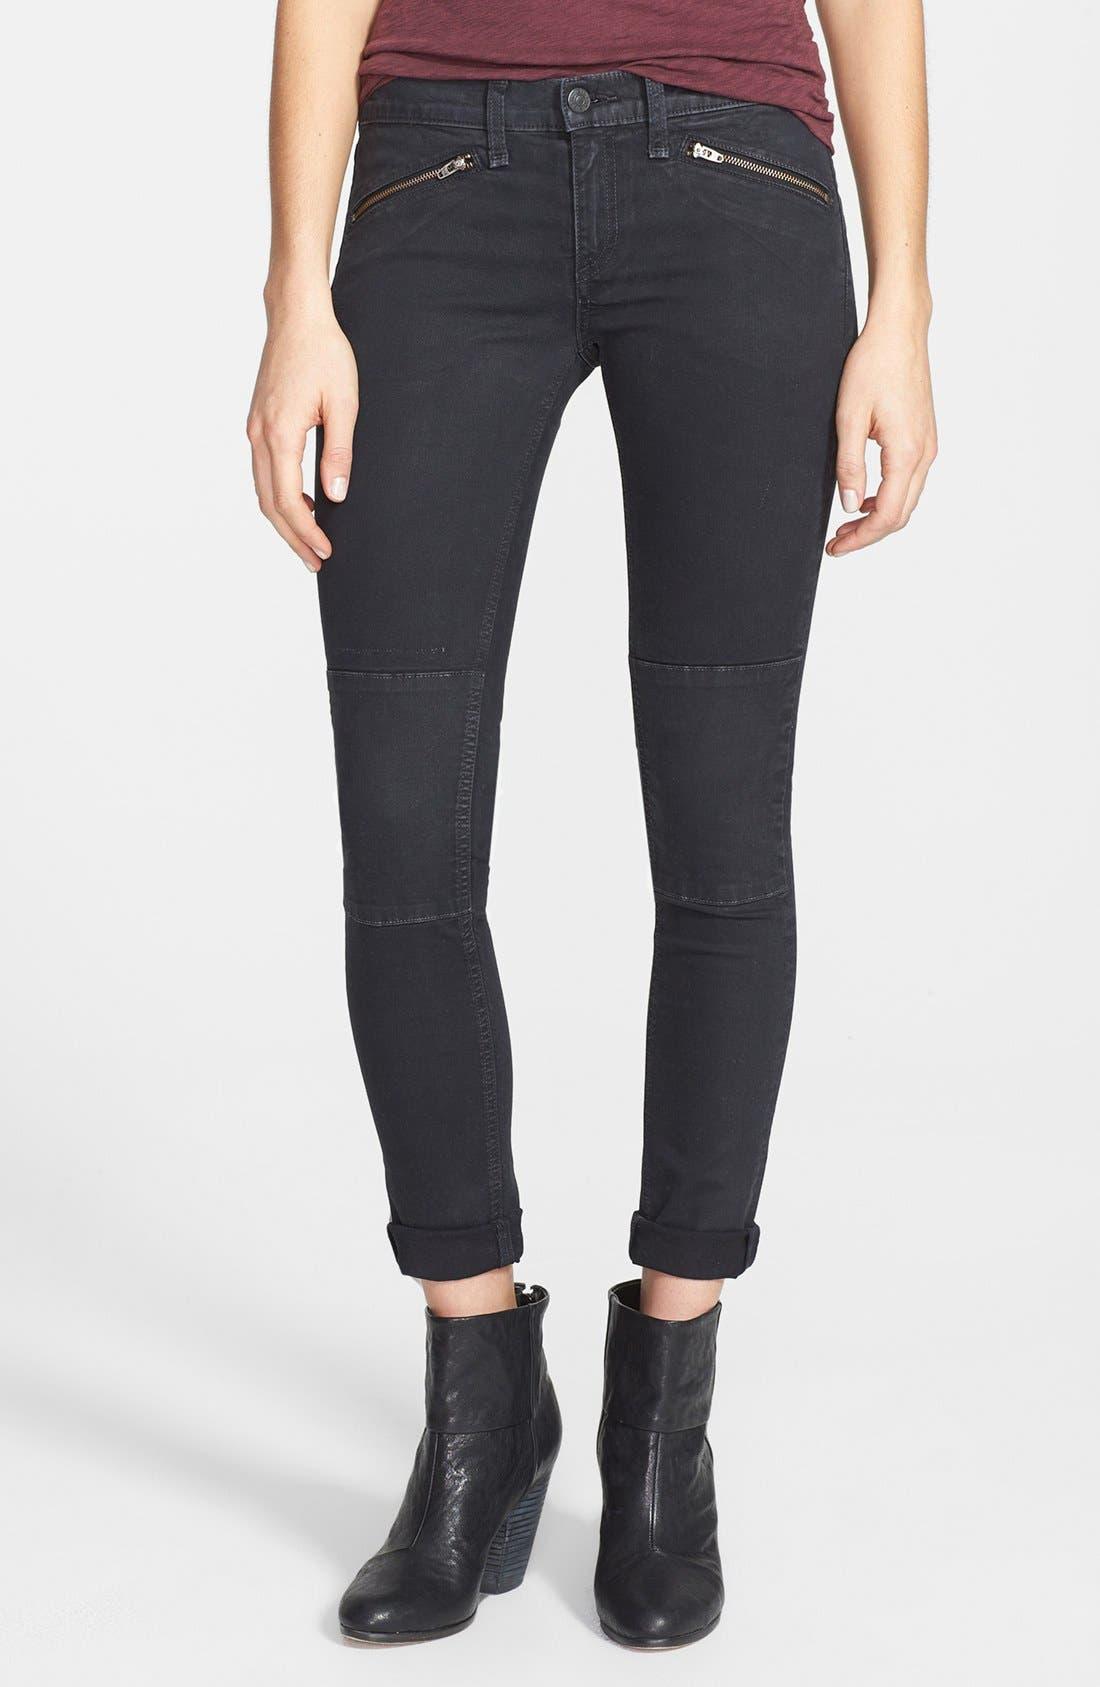 Alternate Image 1 Selected - rag & bone/JEAN 'Ridley' Moto Skinny Jeans (Wax Black)